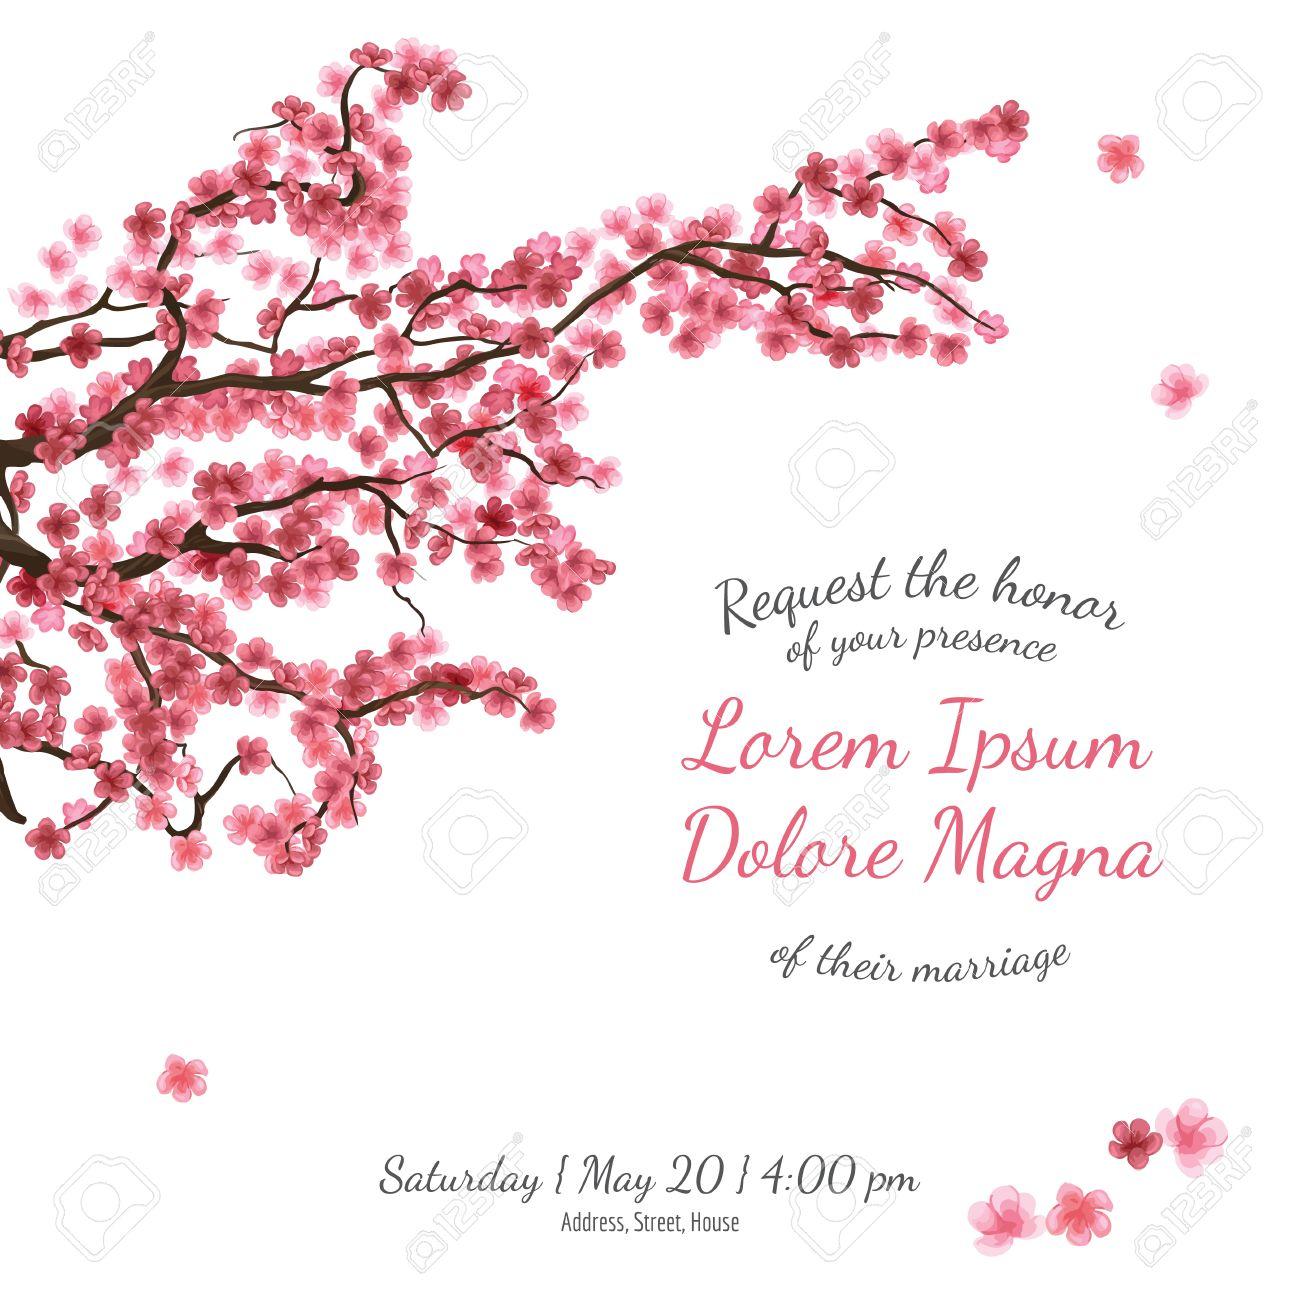 Invitation Bridal Shower Card With Sakura Vector Template For - Bridal shower card template